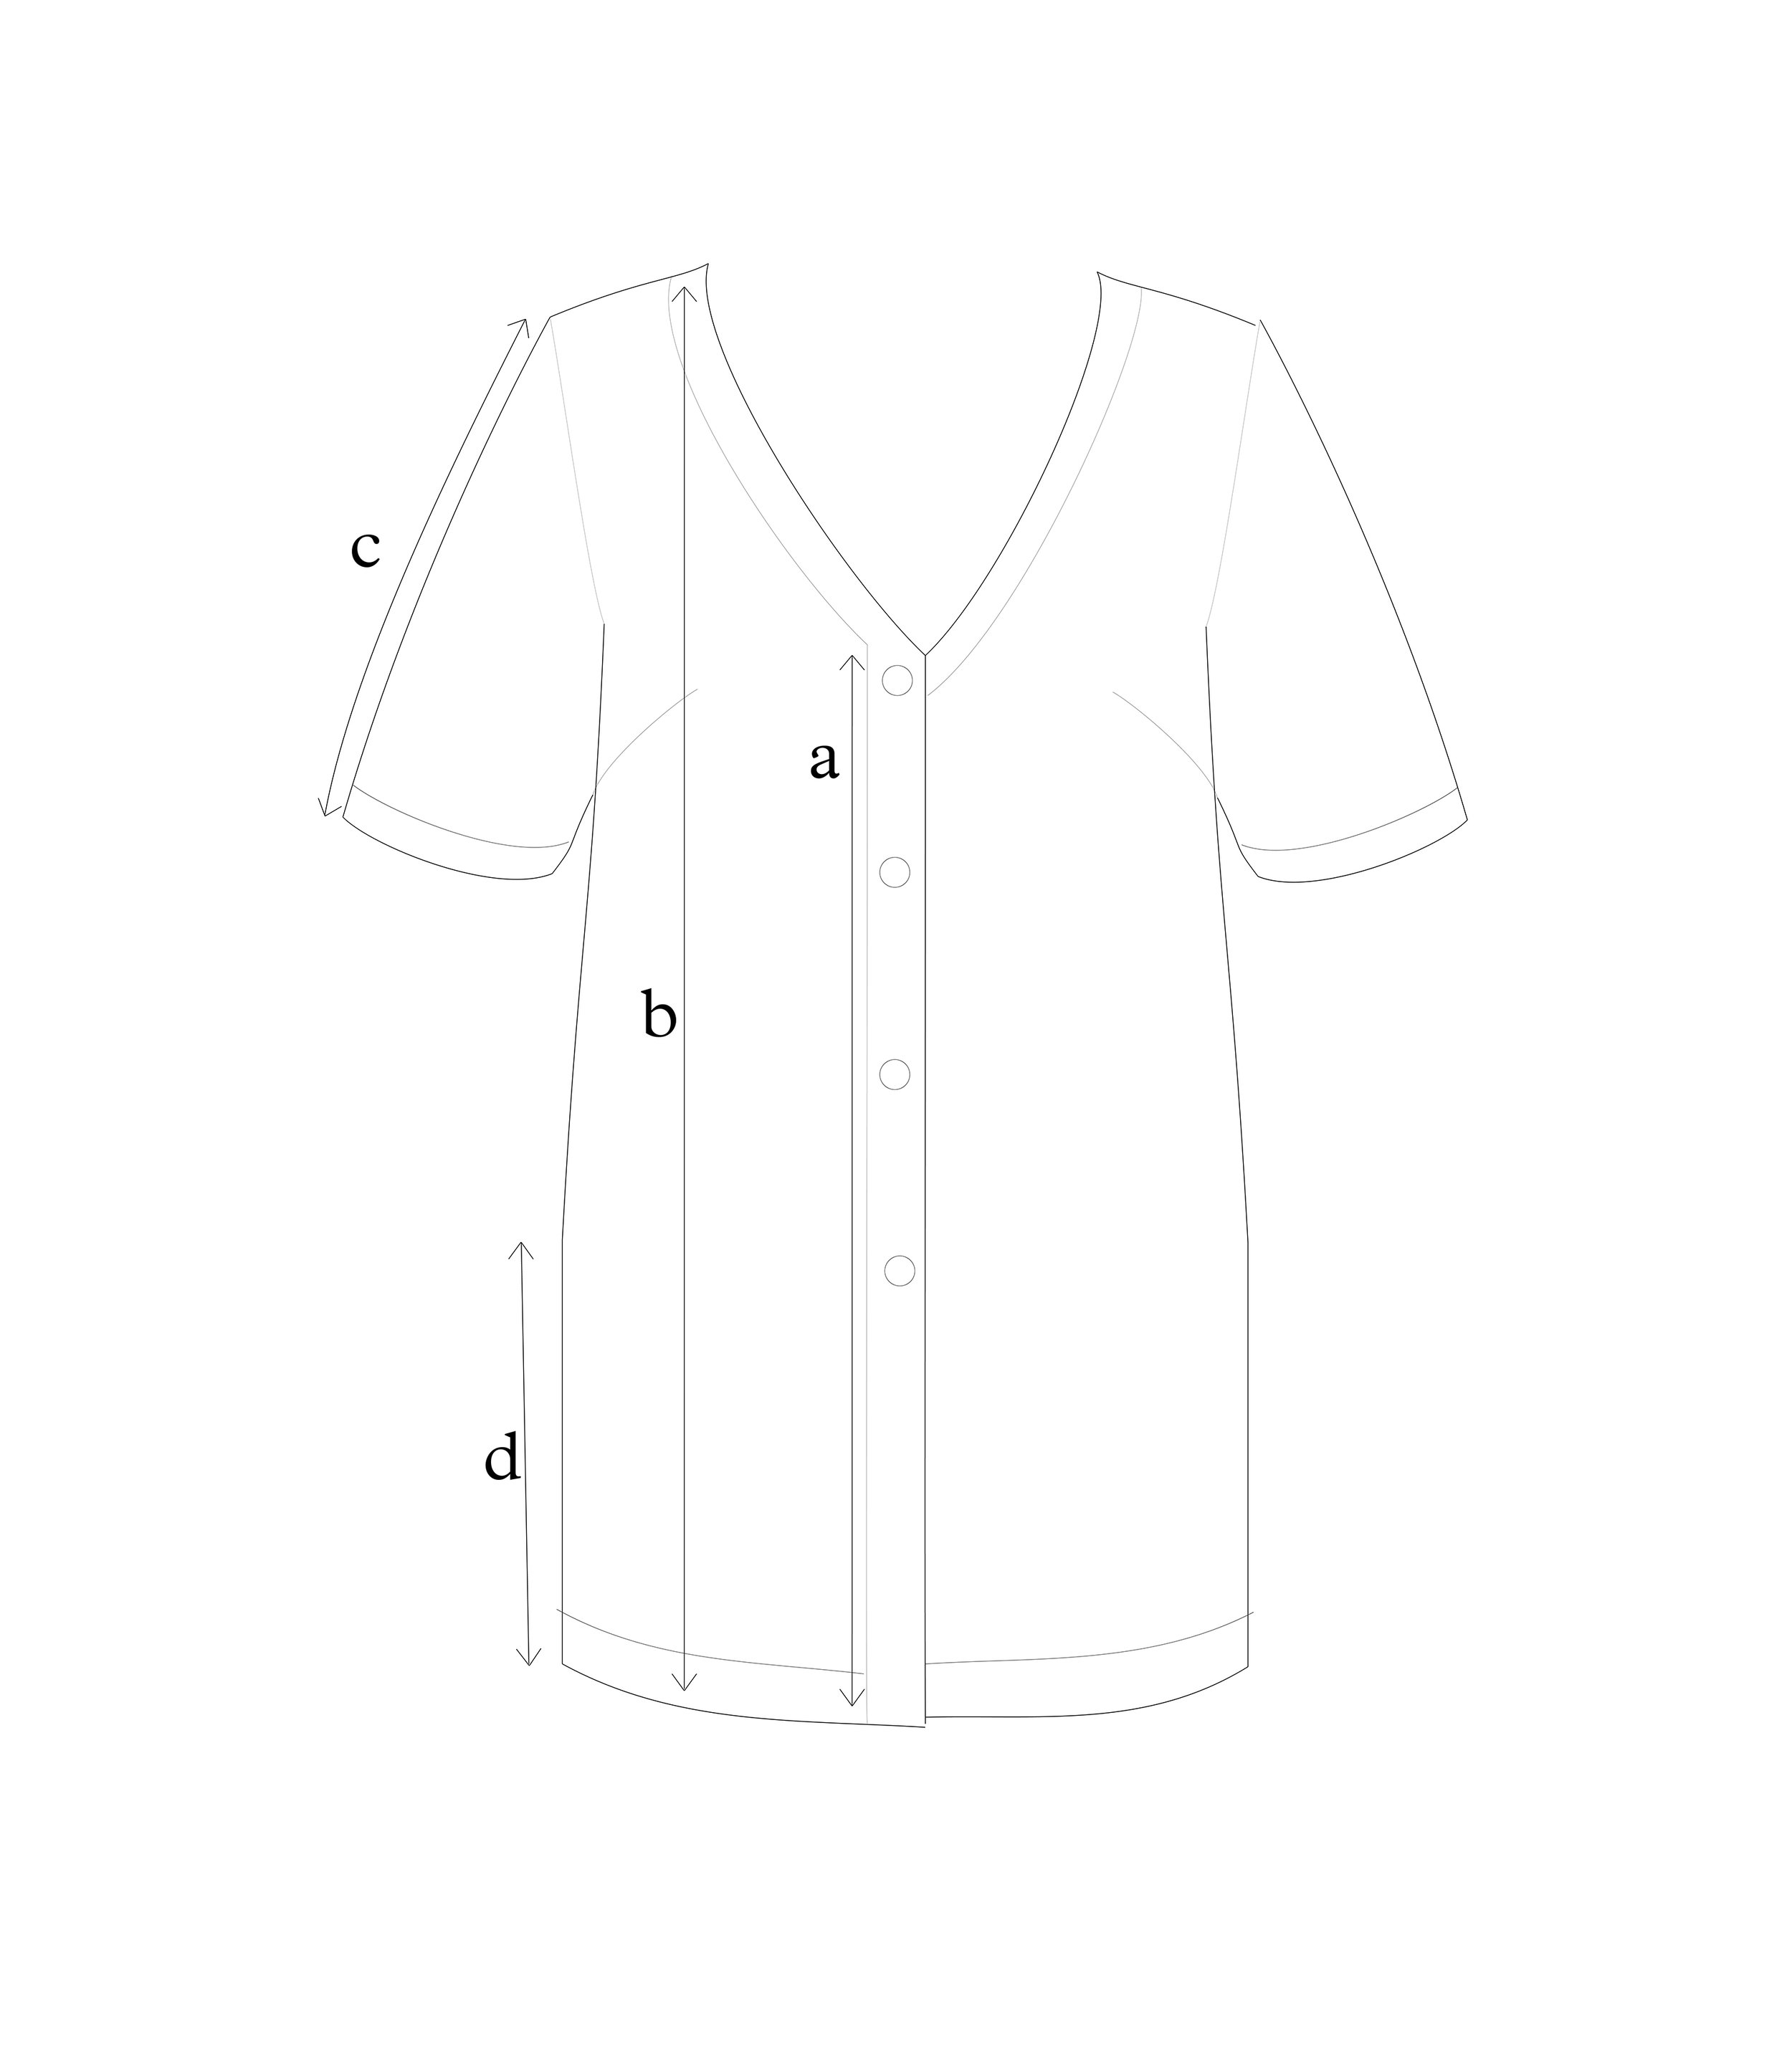 #042 shirt - line drawing.jpg